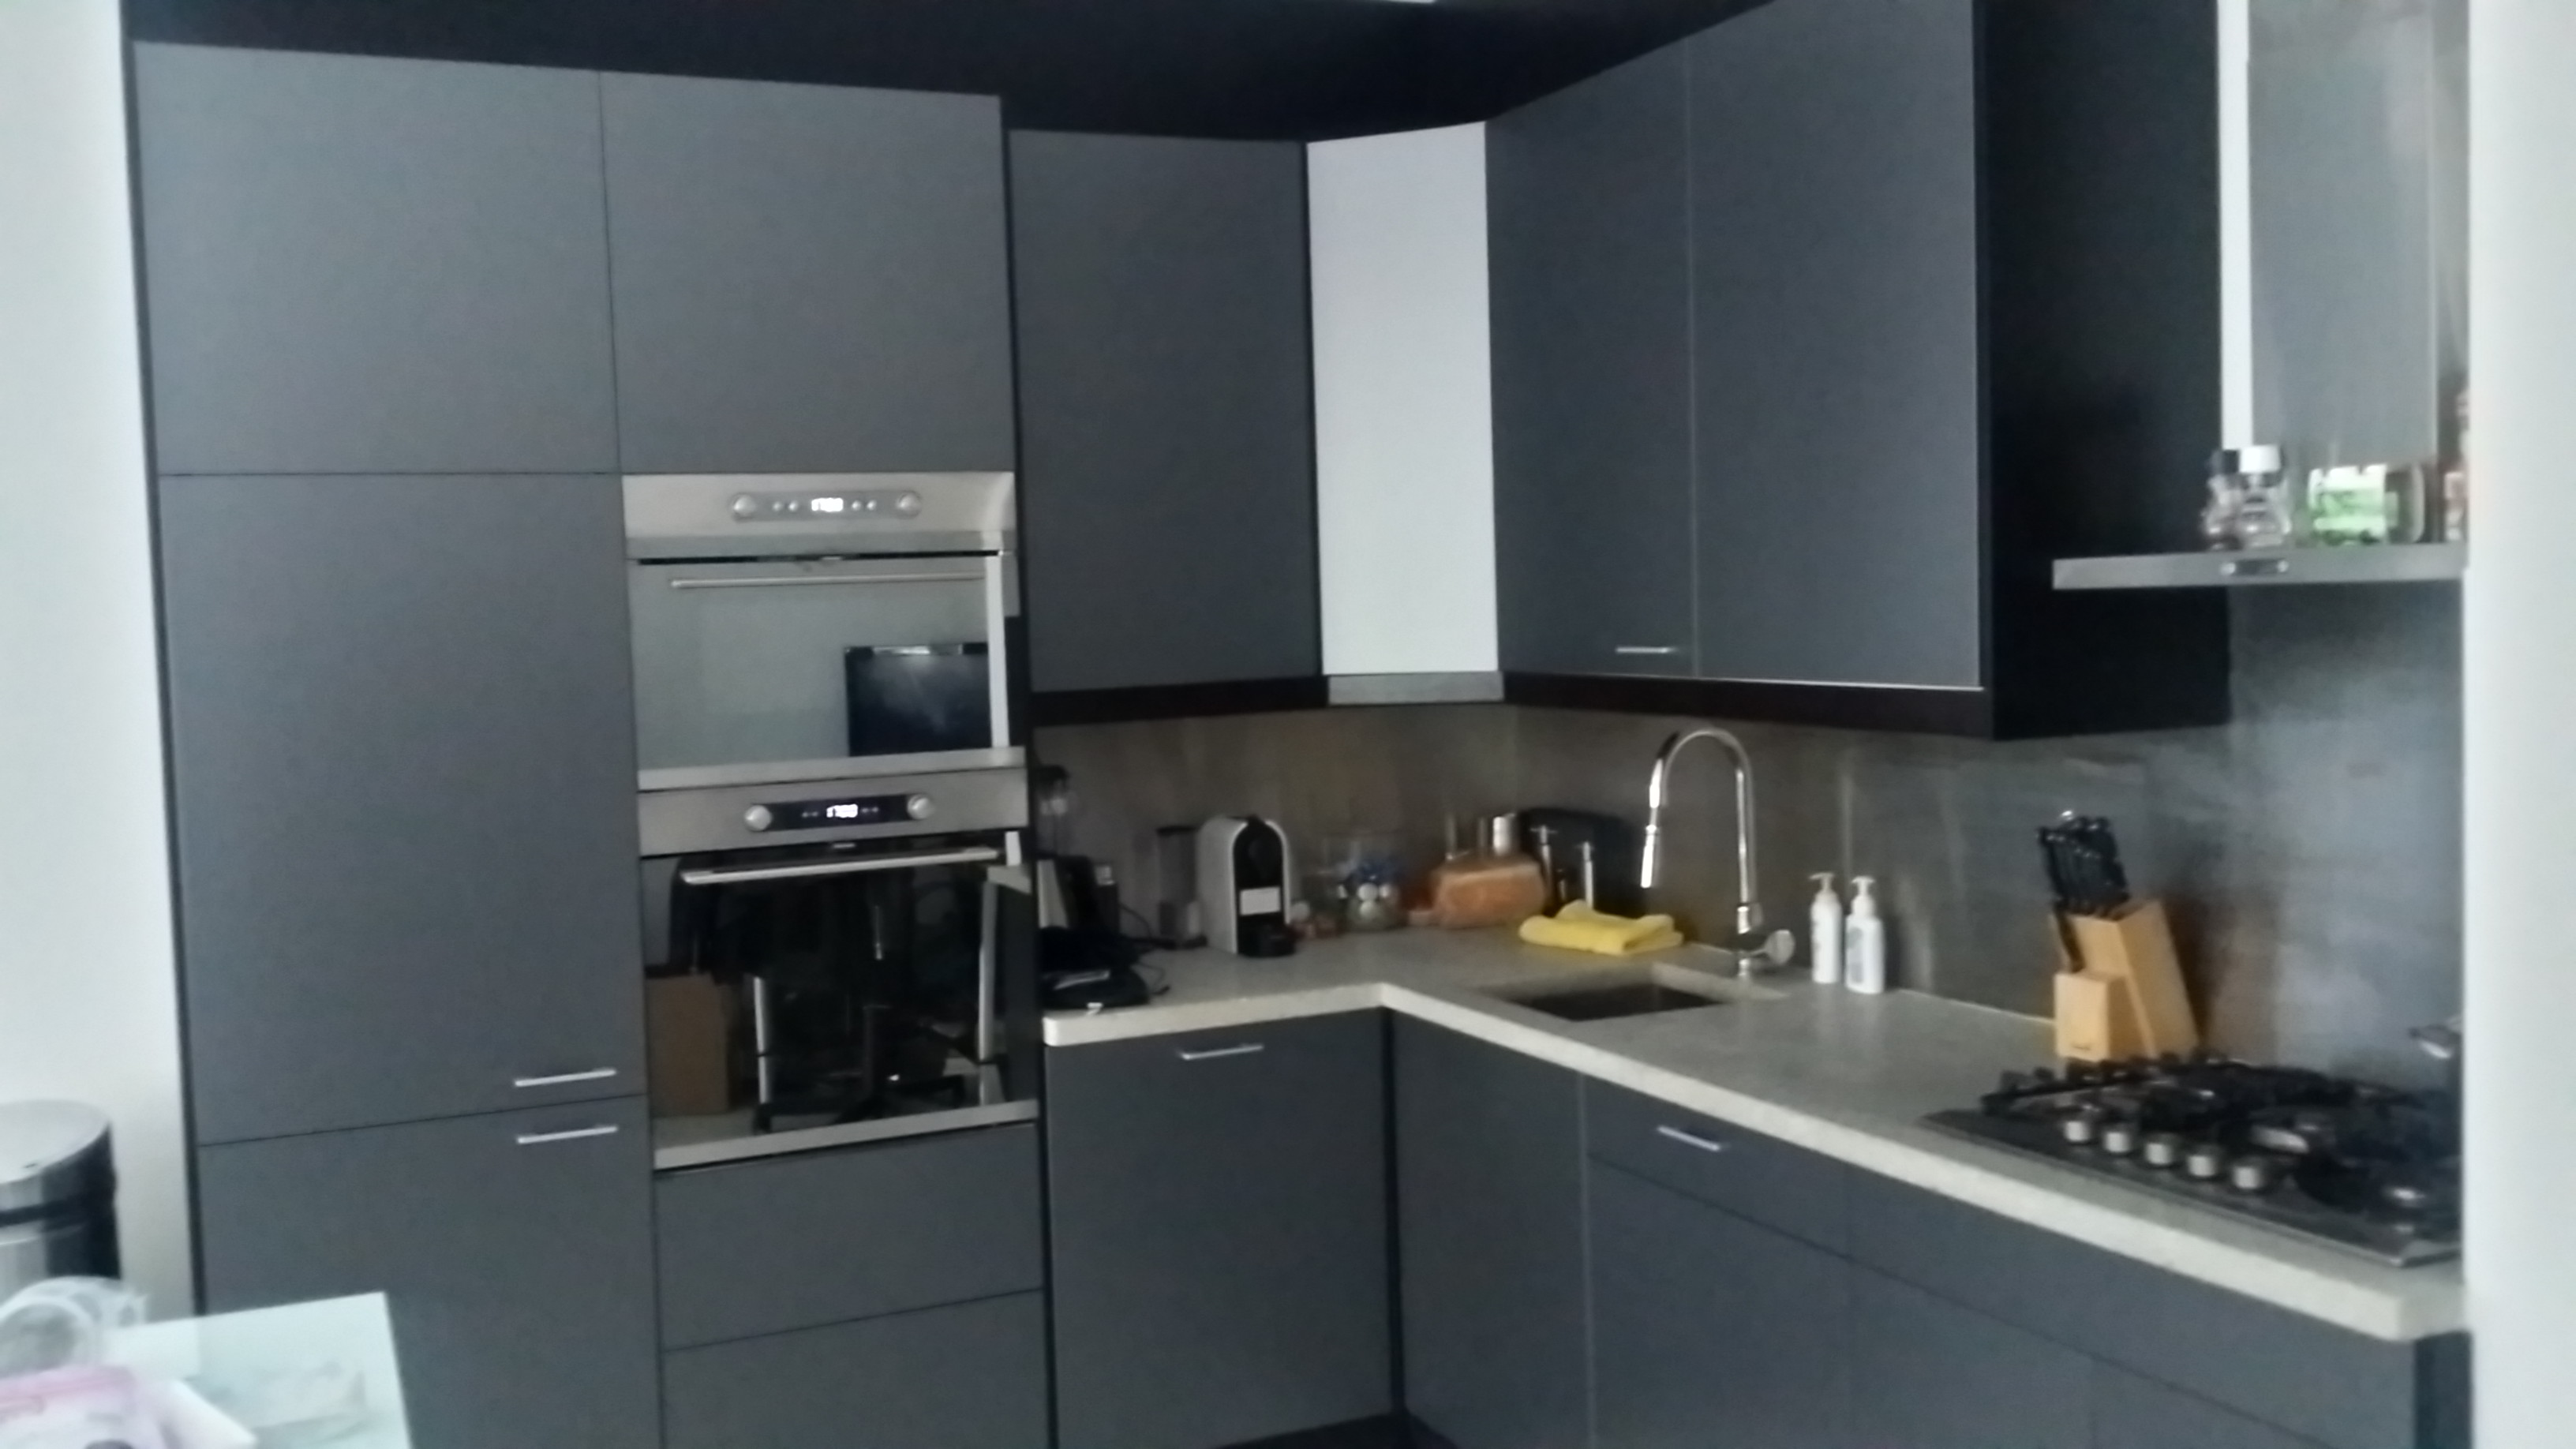 Keuken Wrappen Ervaringen : Keuken wrappen bizconnect